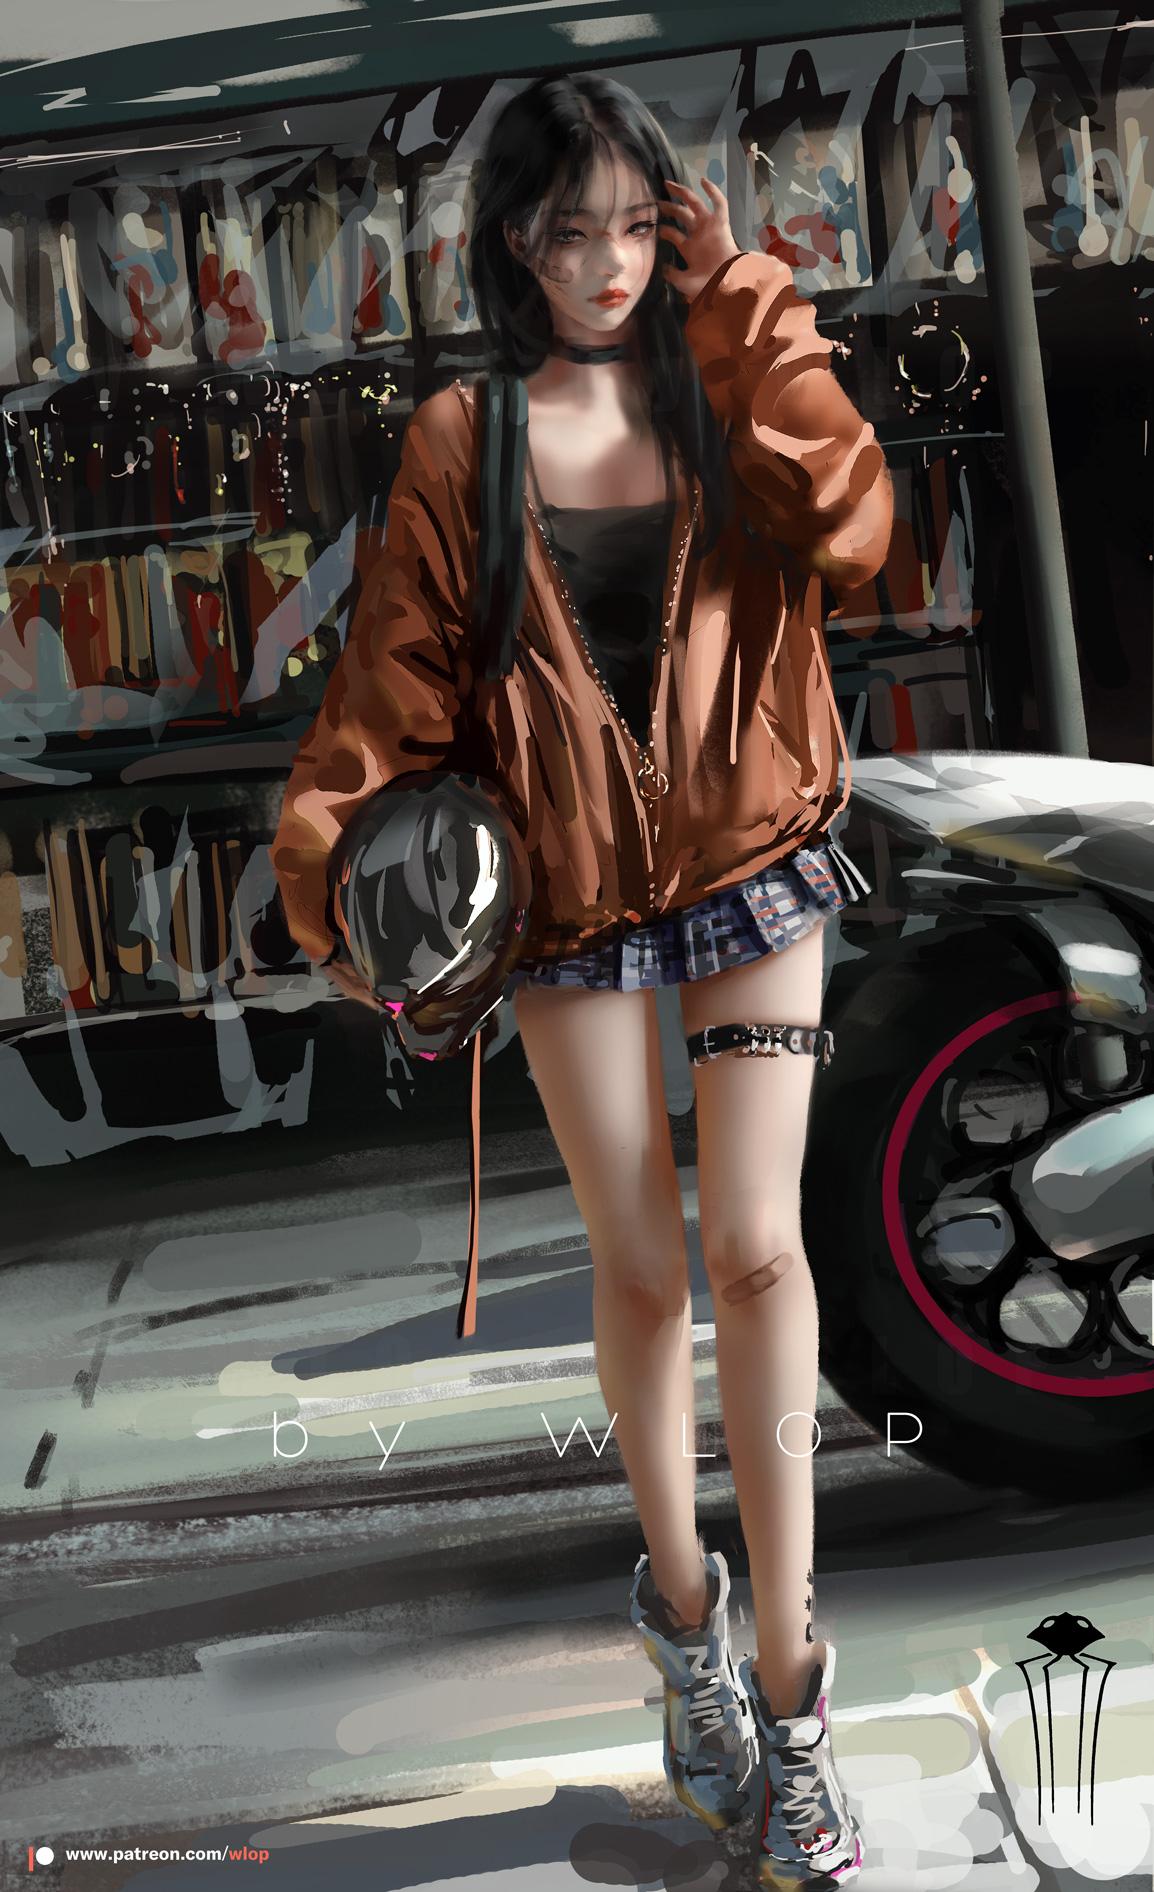 General 1154x1892 digital art women urban miniskirt motorcycle vehicle looking at viewer artwork anime girls